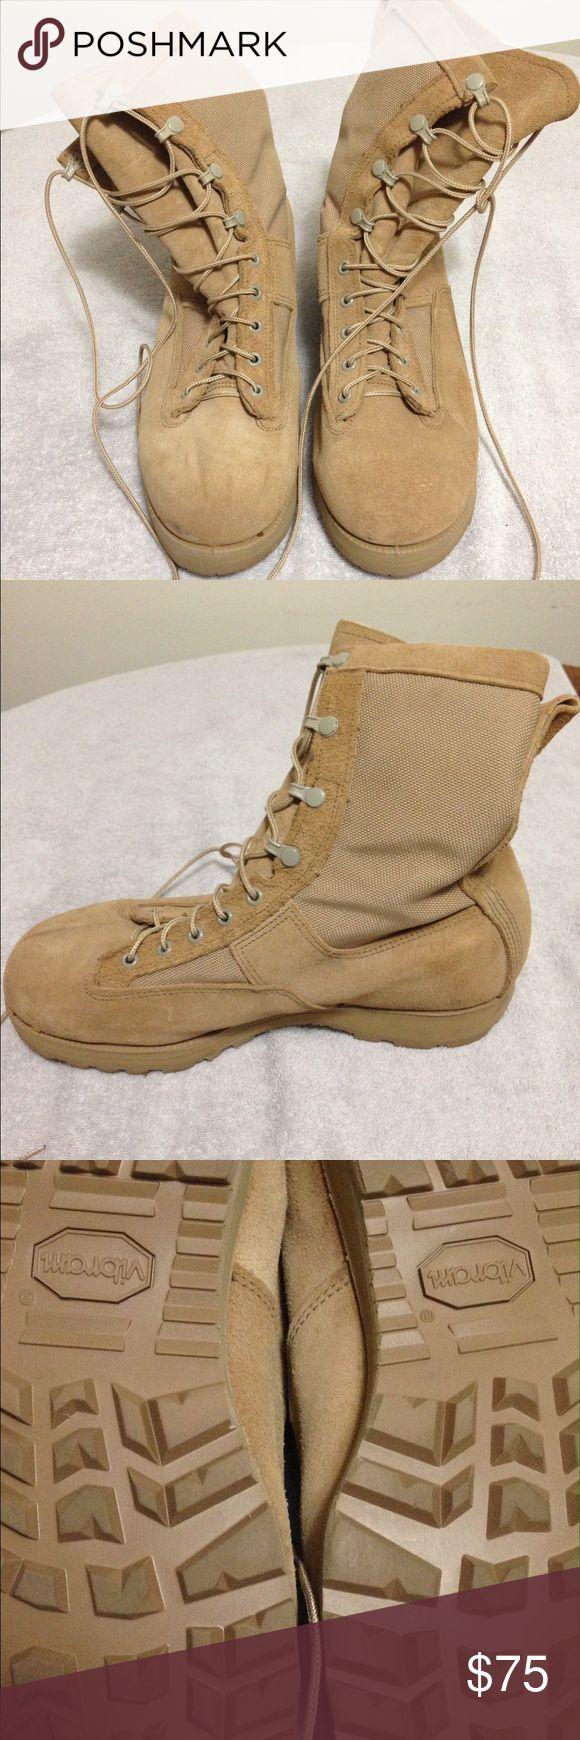 Men's Combat Boots NWOT men's Army Combat Boots made by Belville. Size 10W. Desert Tan. Belville Shoes Boots